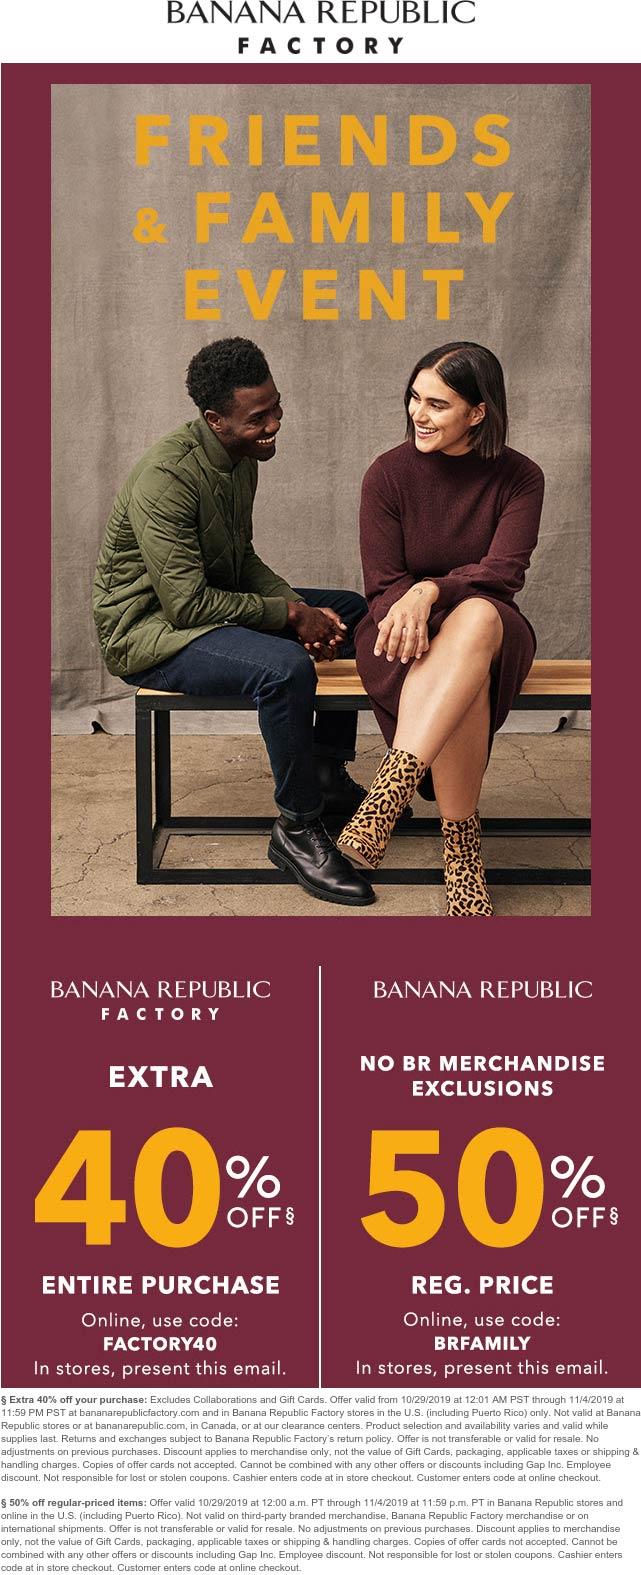 Banana Republic Coupon January 2020 Extra 50% off at Banana Republic & 40% at factory locations, 50% online via promo BRFAMILY